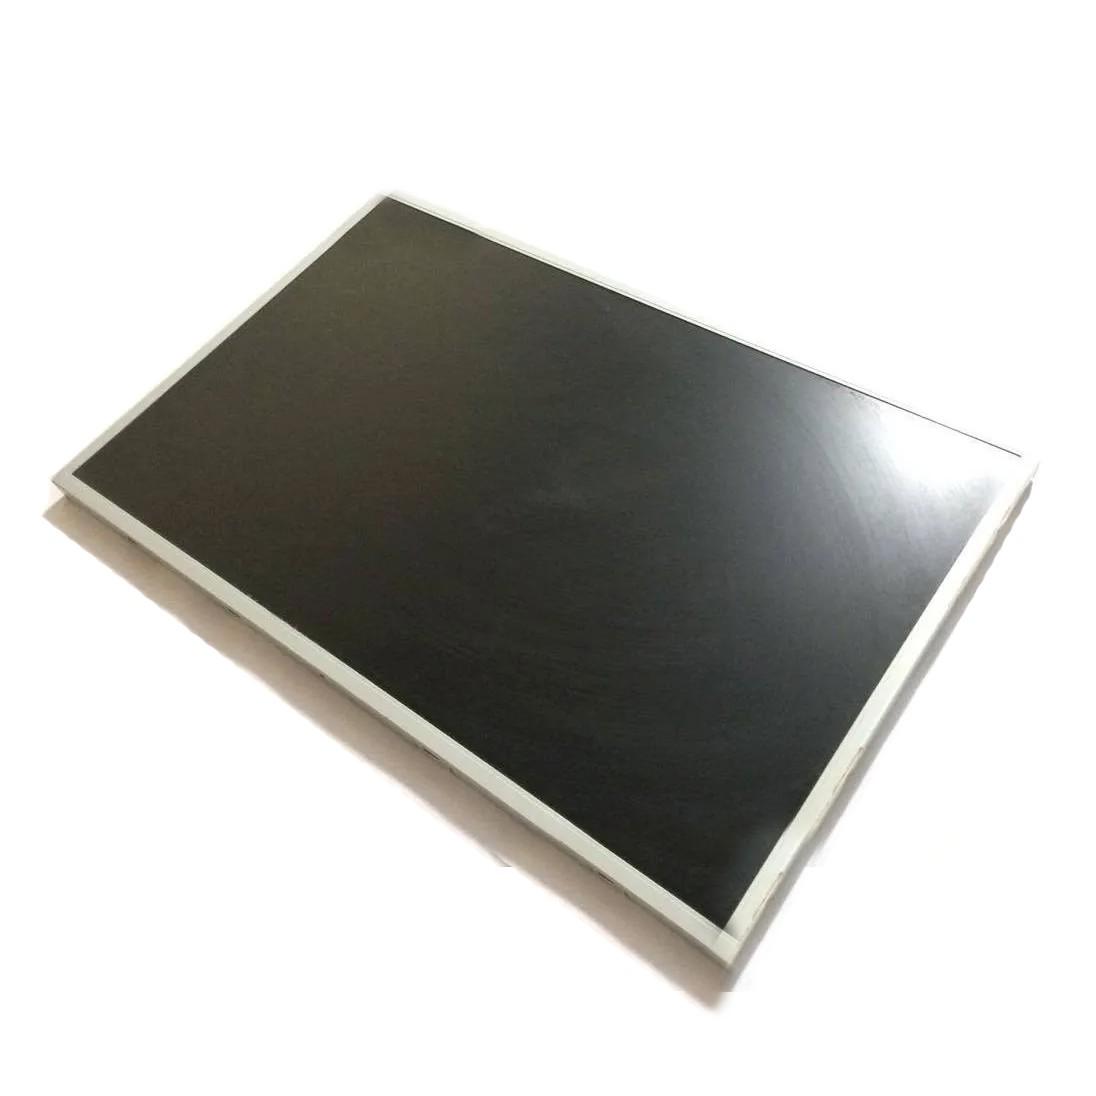 Tela Display LCD Monitor LG W1952tq-pf PN:SVA190WX02TB - Retirado